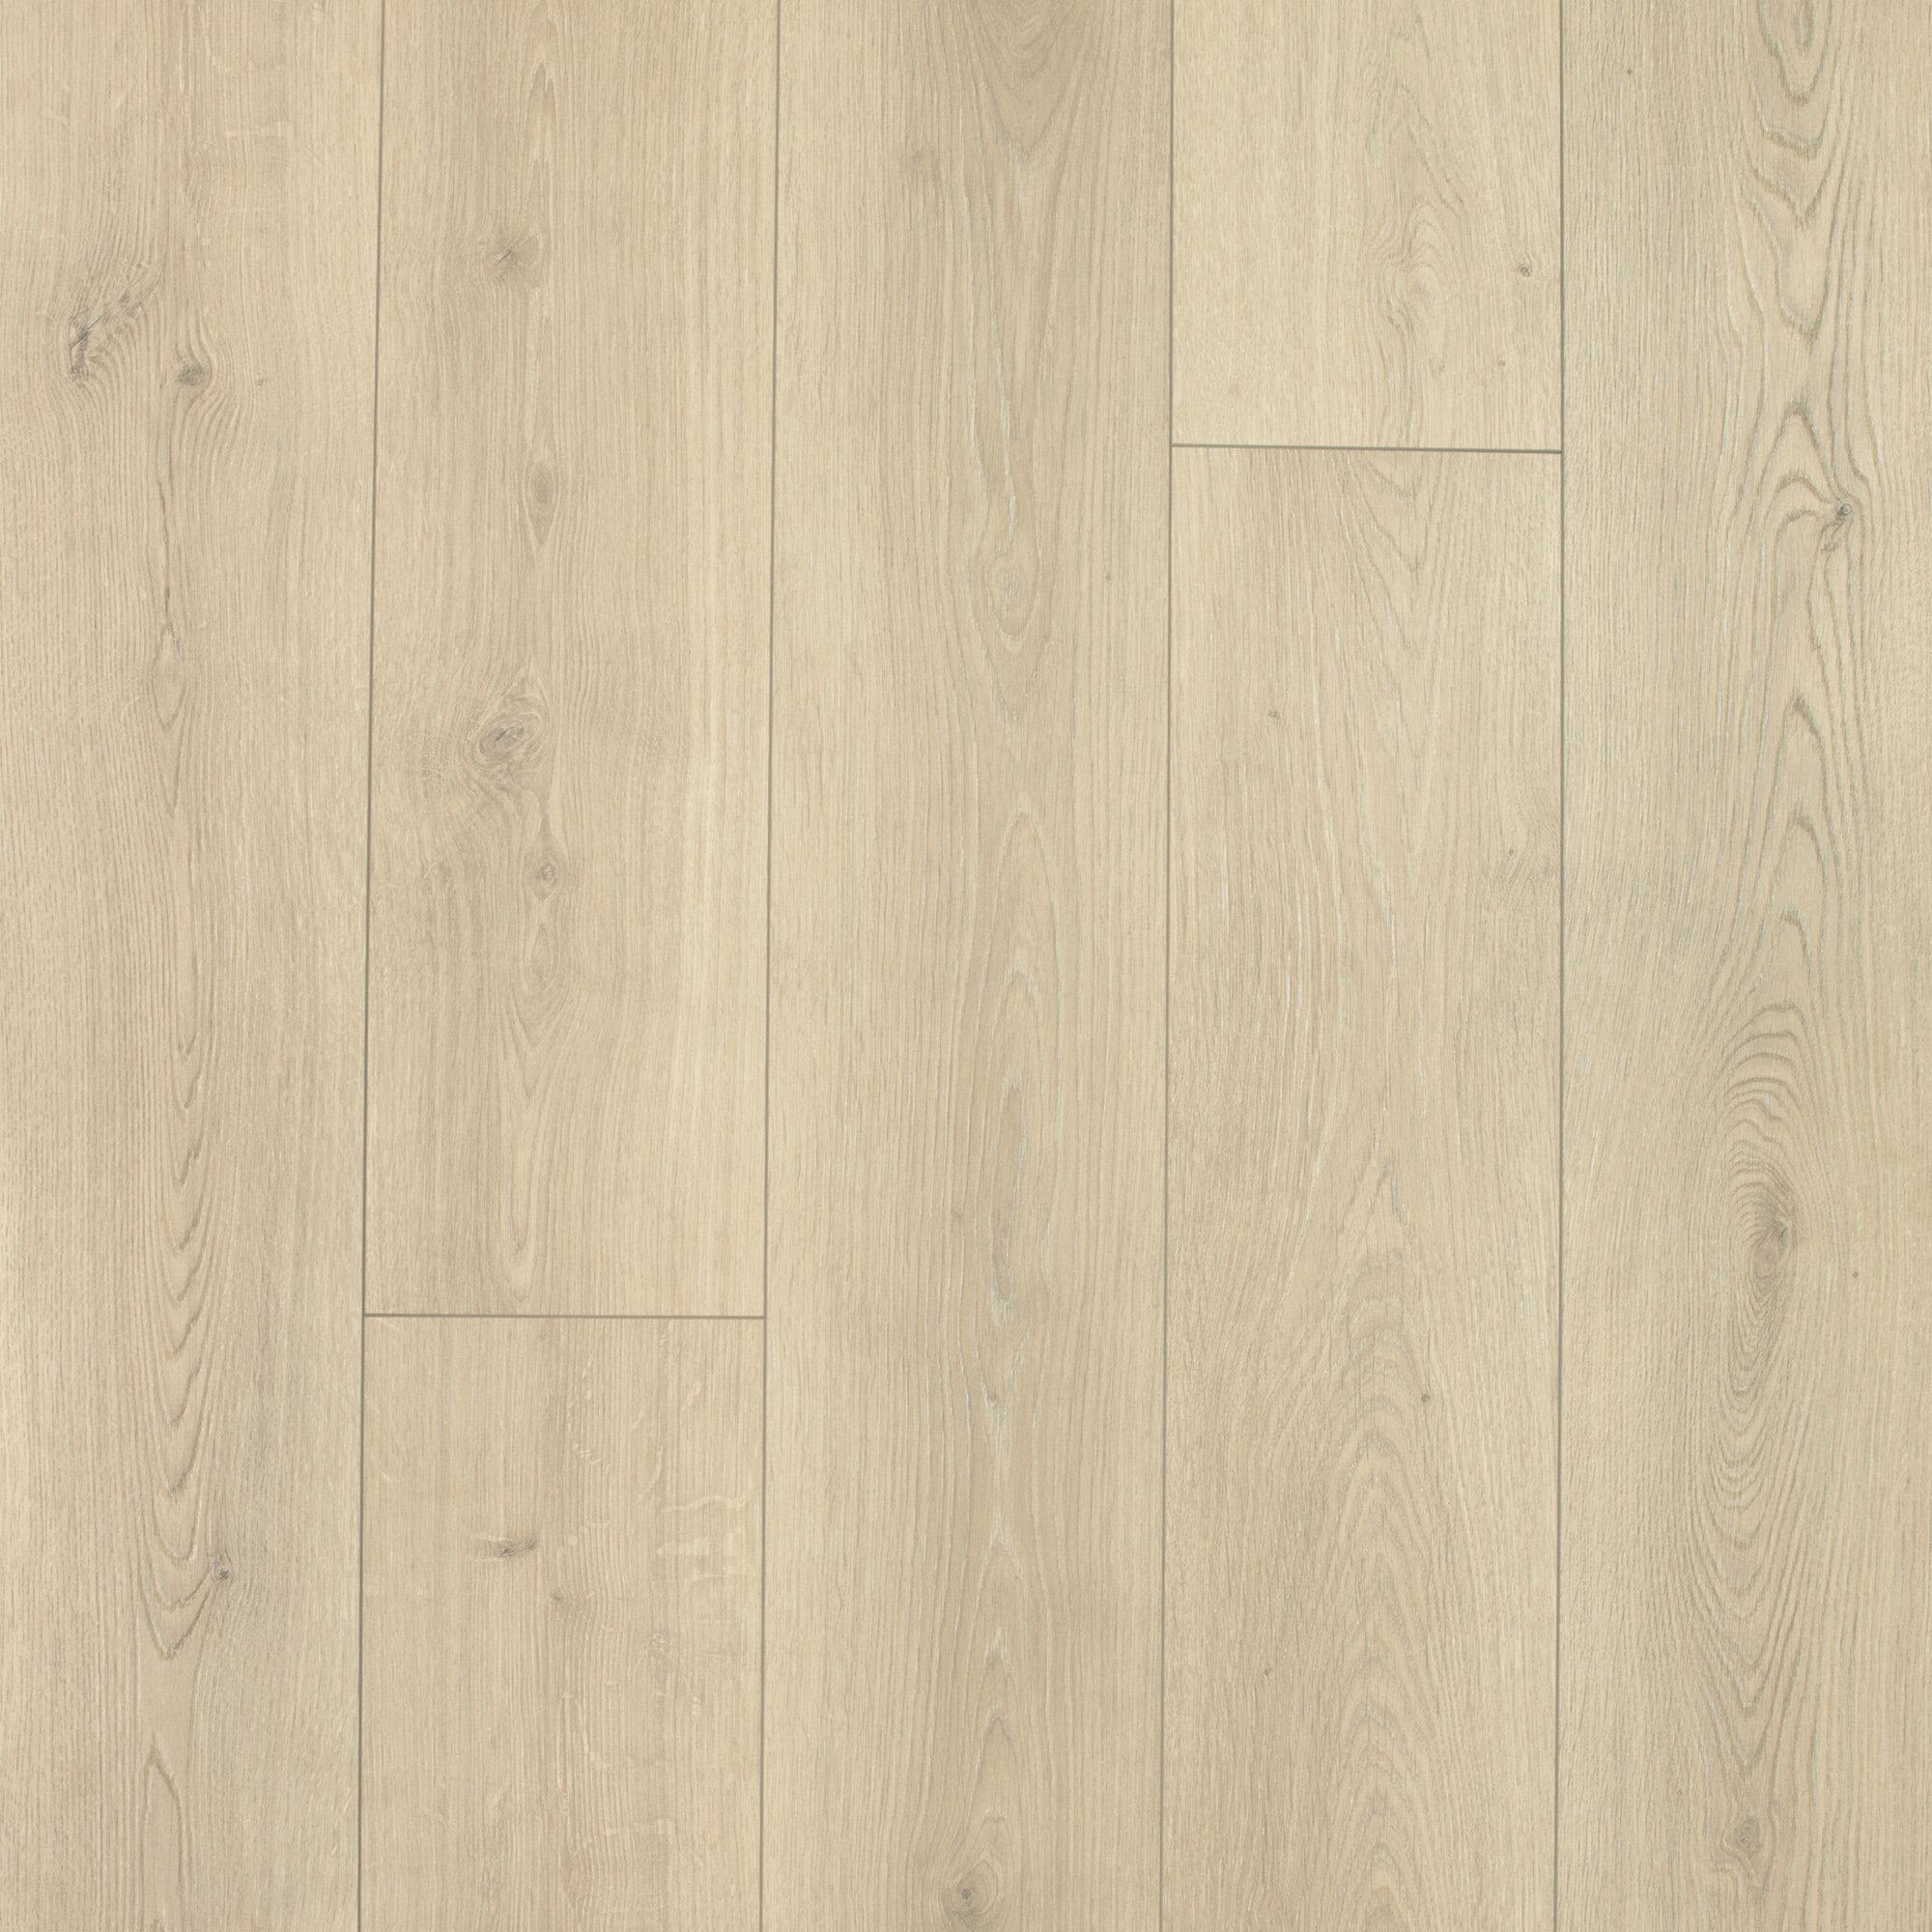 X 12mm Oak Laminate Flooring